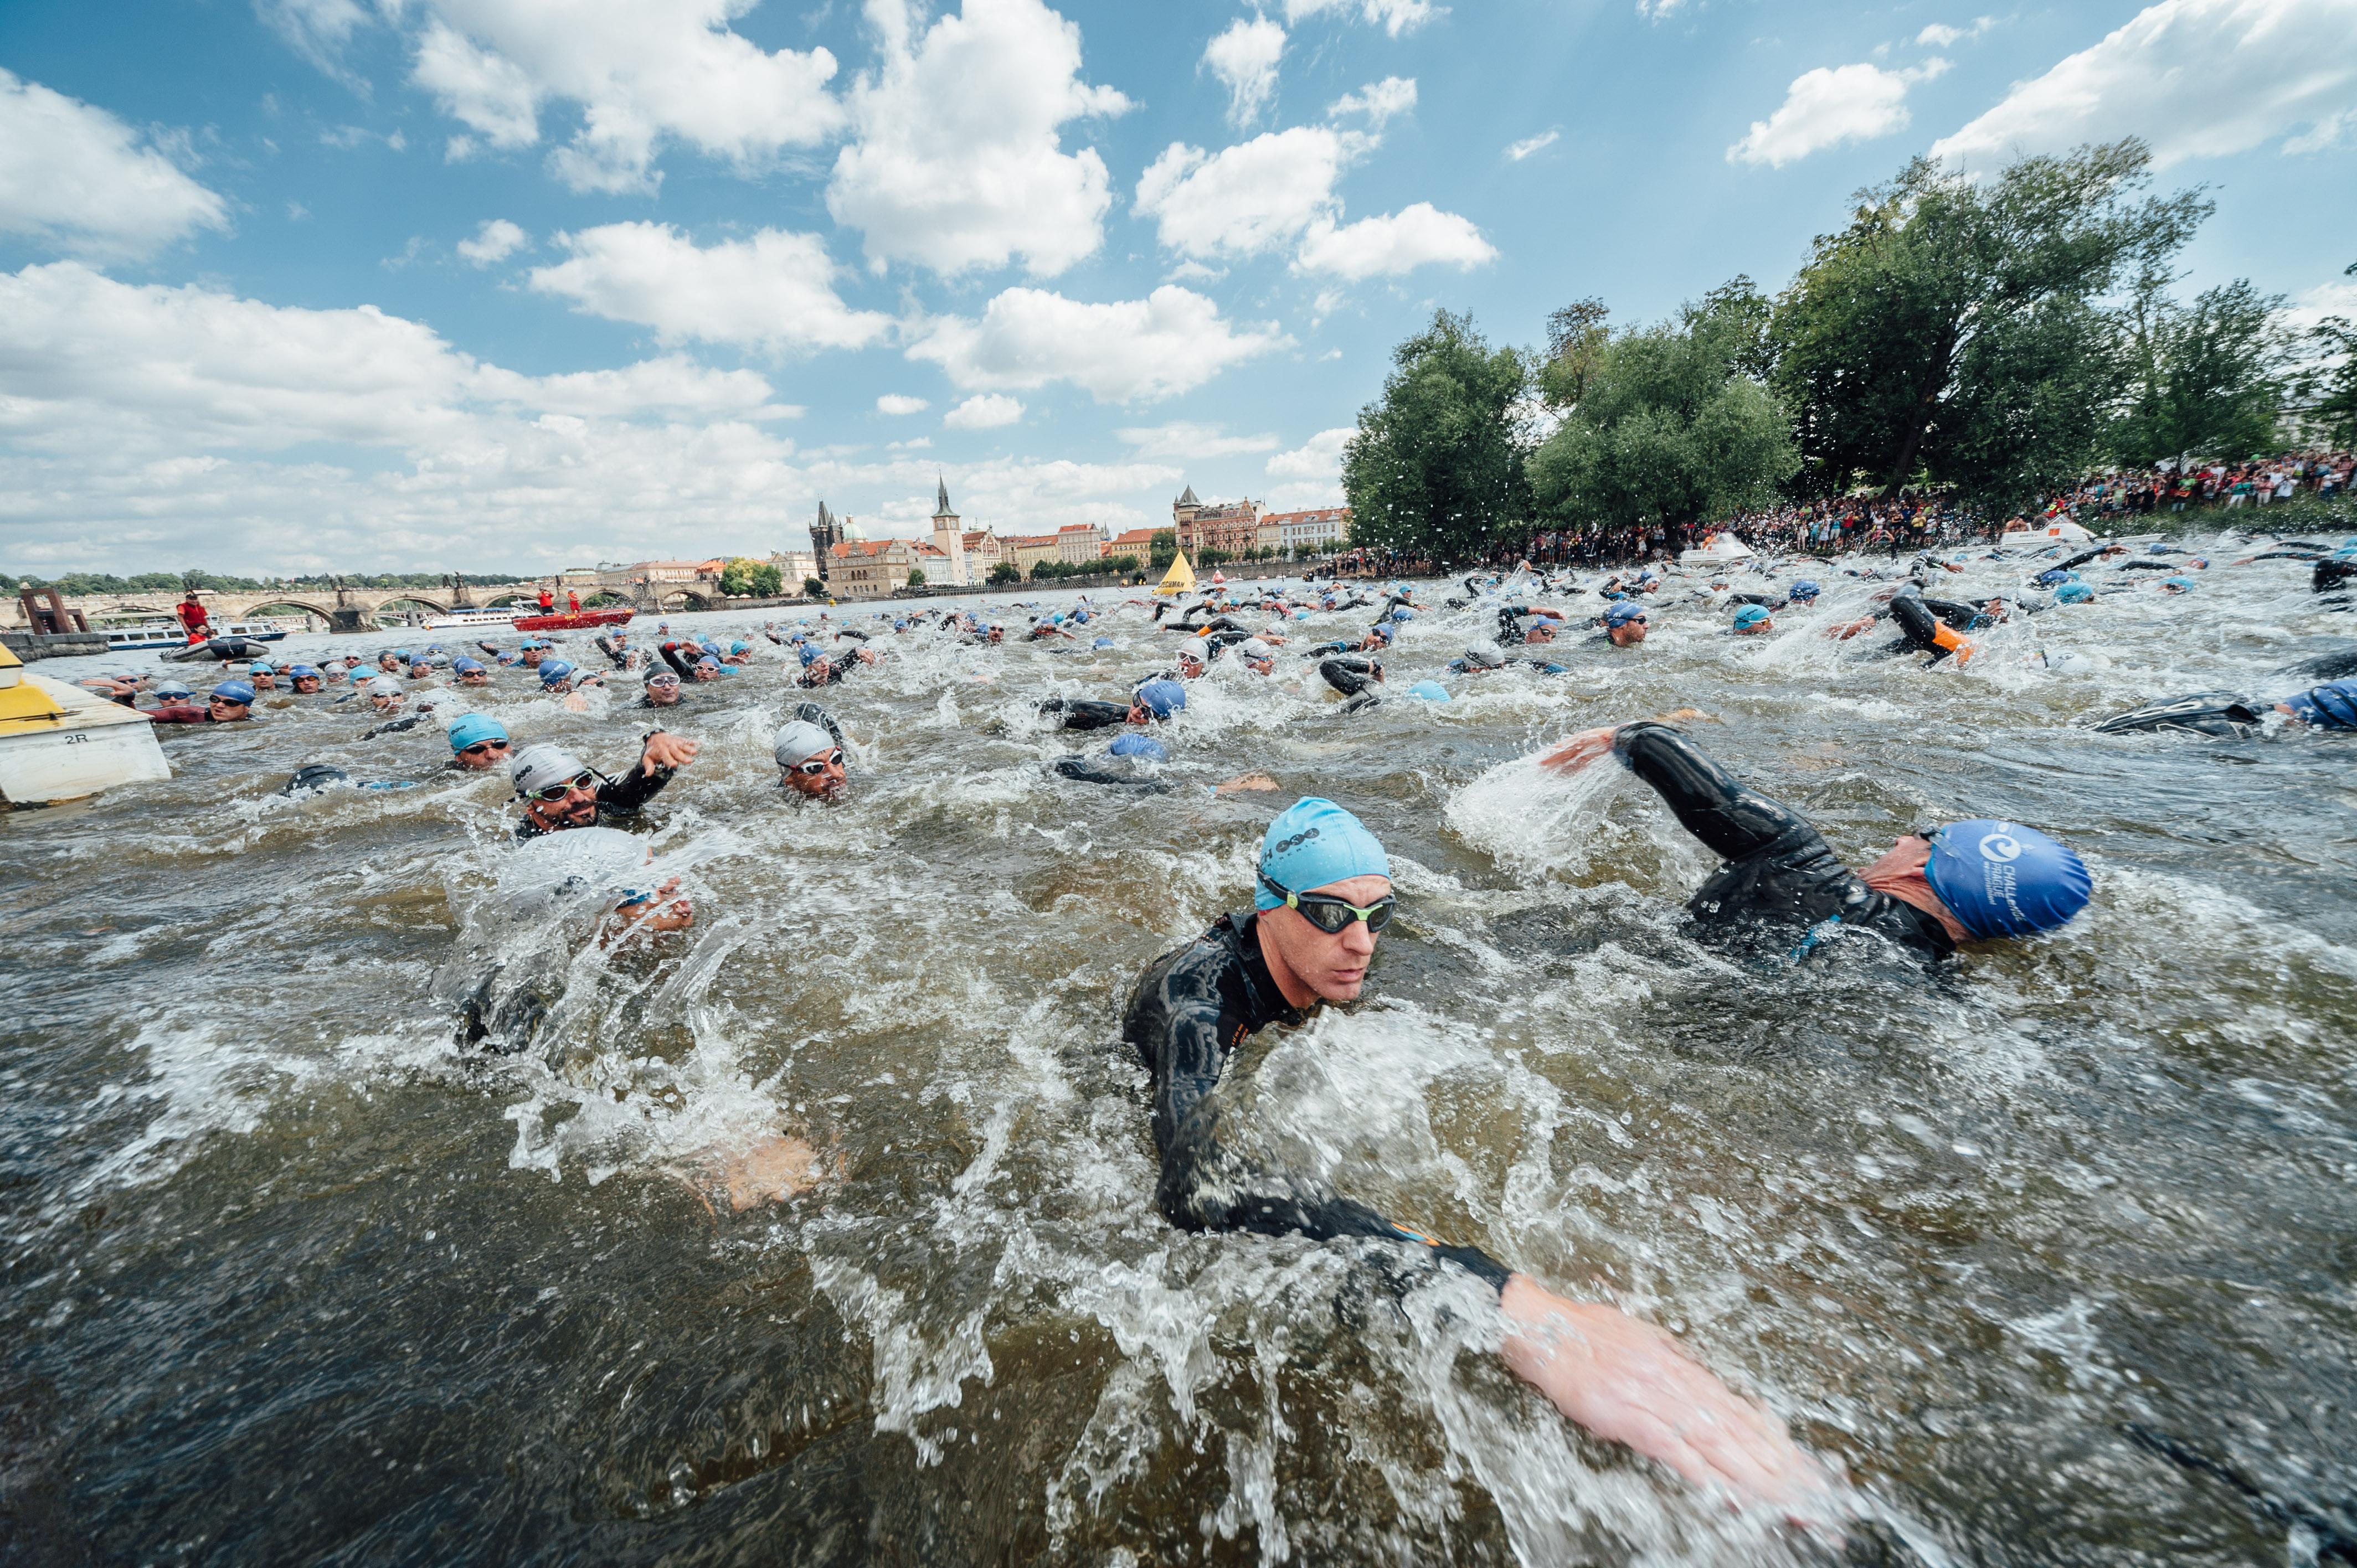 dopravni-informace-k-triatlonu-ford-challengeprague